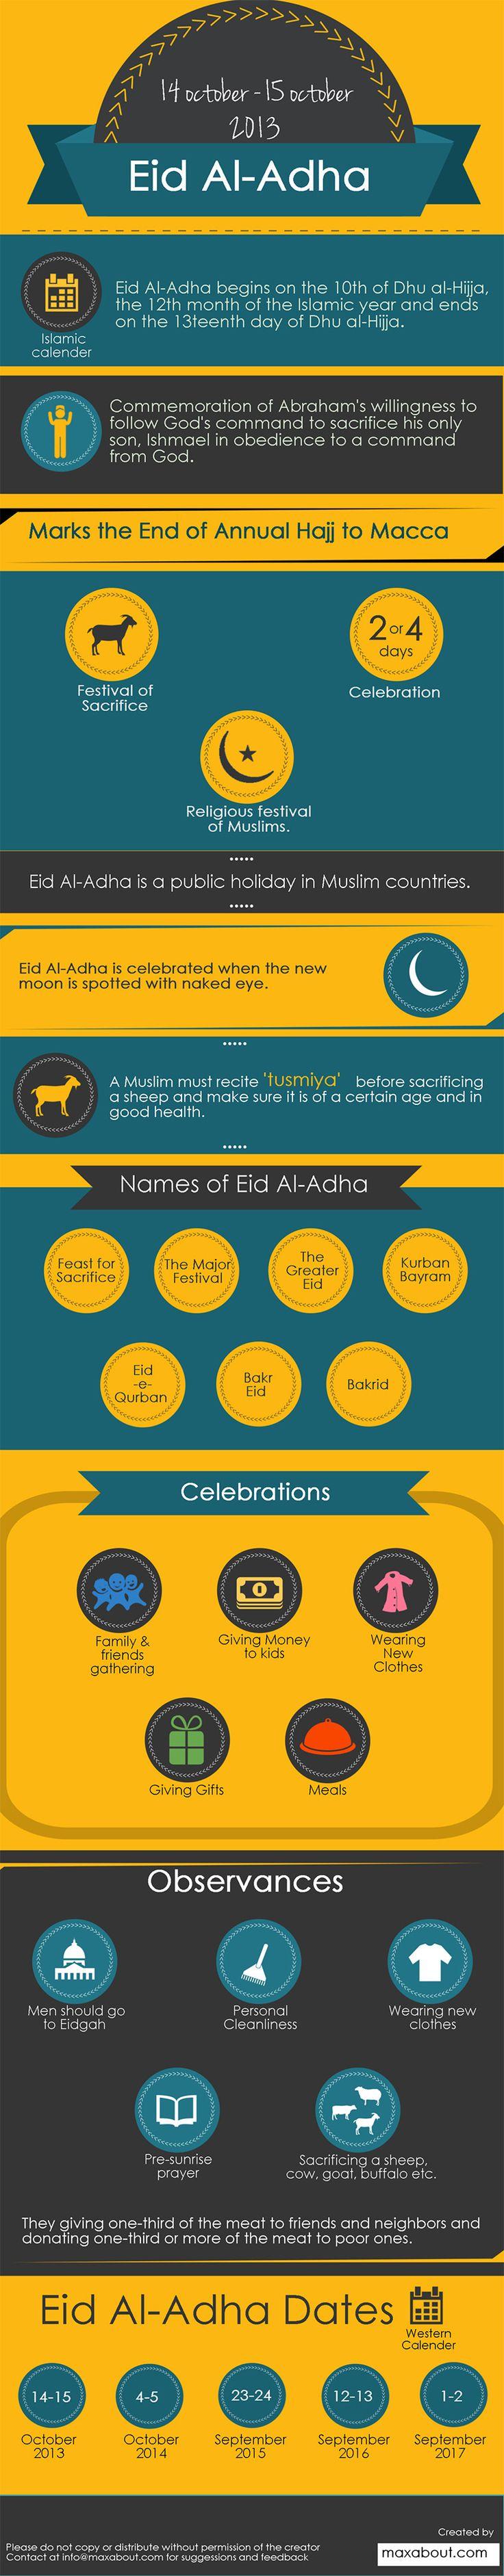 According to the Islamic calender, Eid Al-Adha begins on the 10th of Dhu al-Hijja, the 12th month of the Islamic year and ends on the 13th day of Dhu al-Hijja.